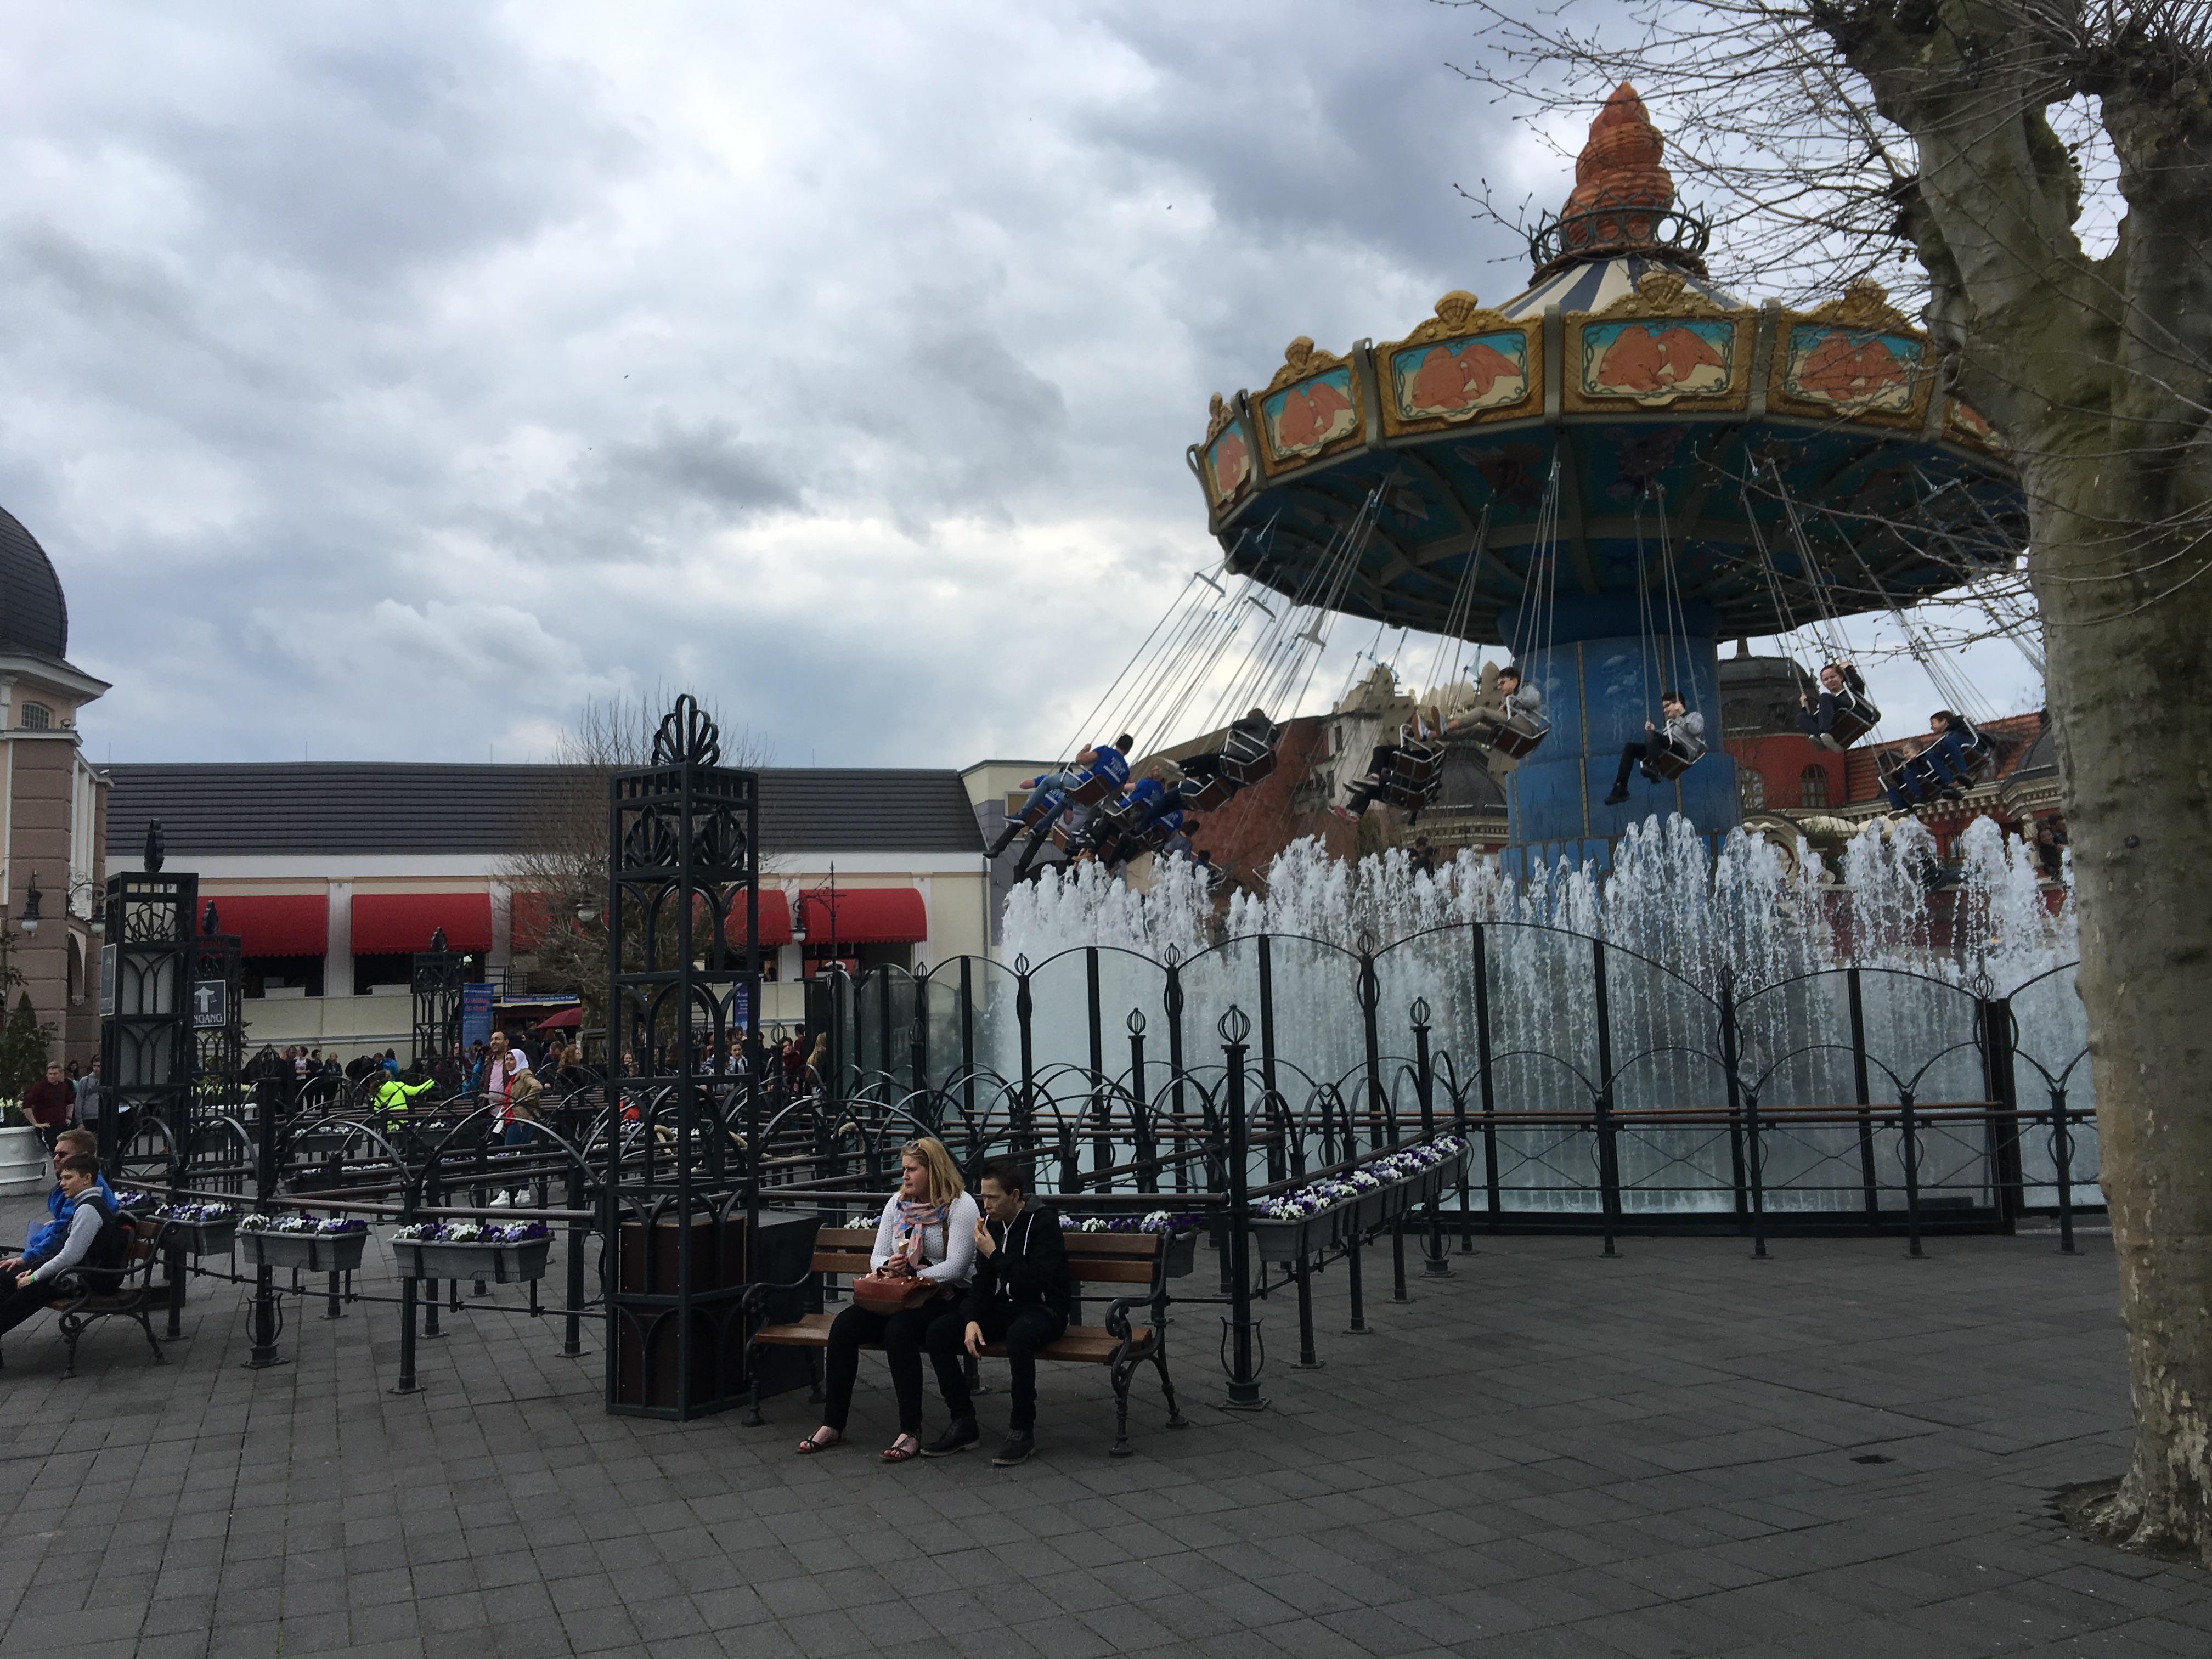 https://www.park-check.de/wp-content/uploads/2017/04/IMG_6019.jpg